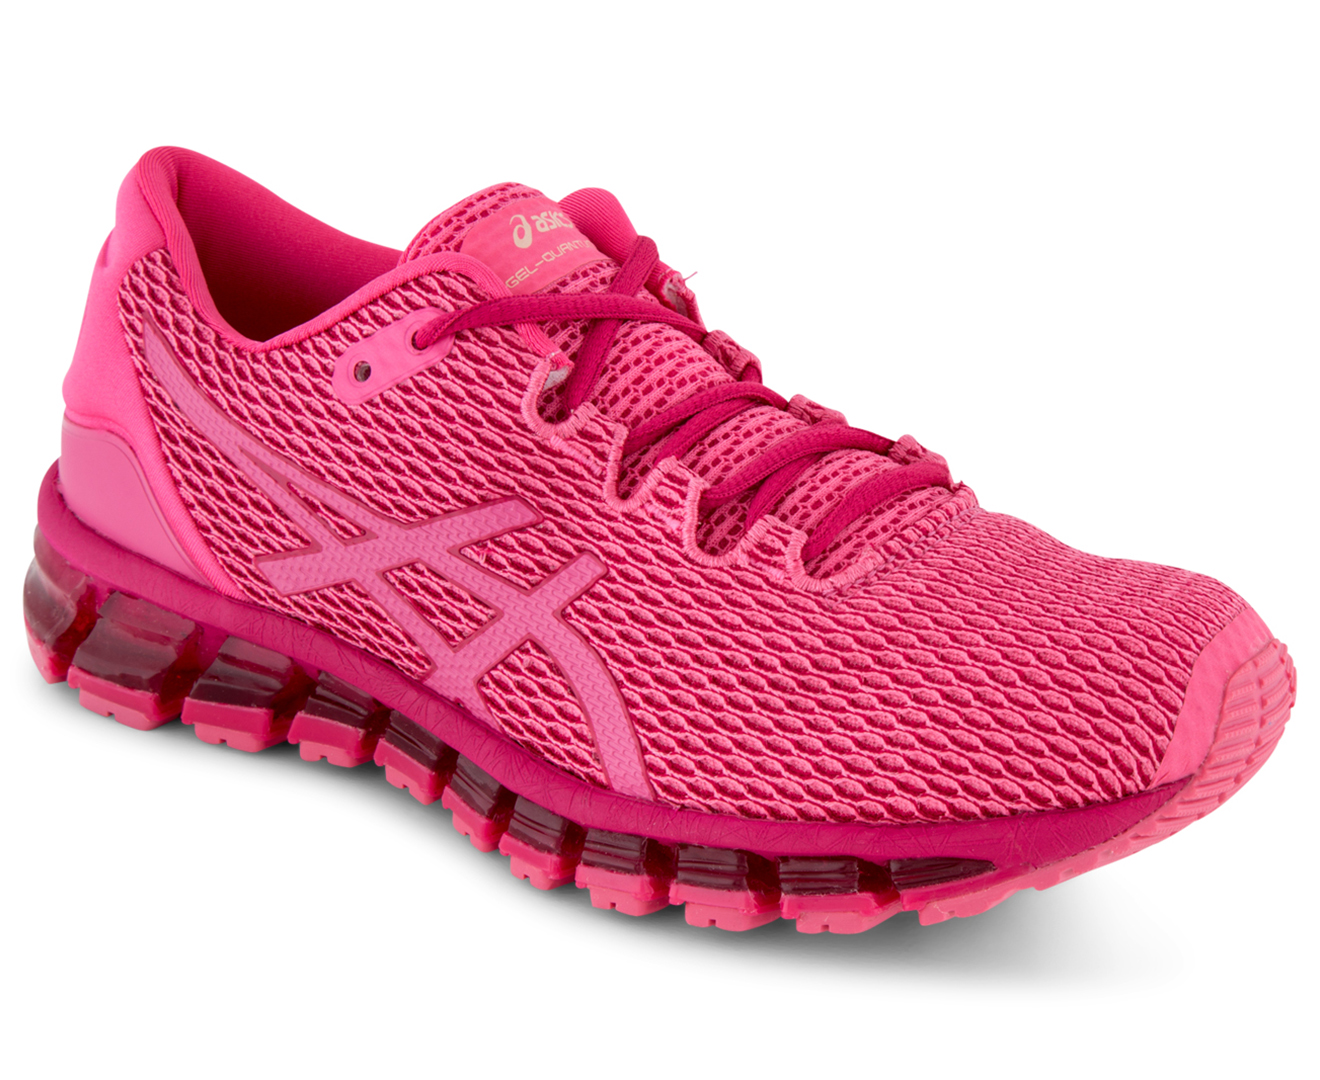 promo code c9f18 10158 ASICS Women's GEL-Quantum 360 Shift MX Shoe - Hot Pink/Bright Rose/Coral  Cloud